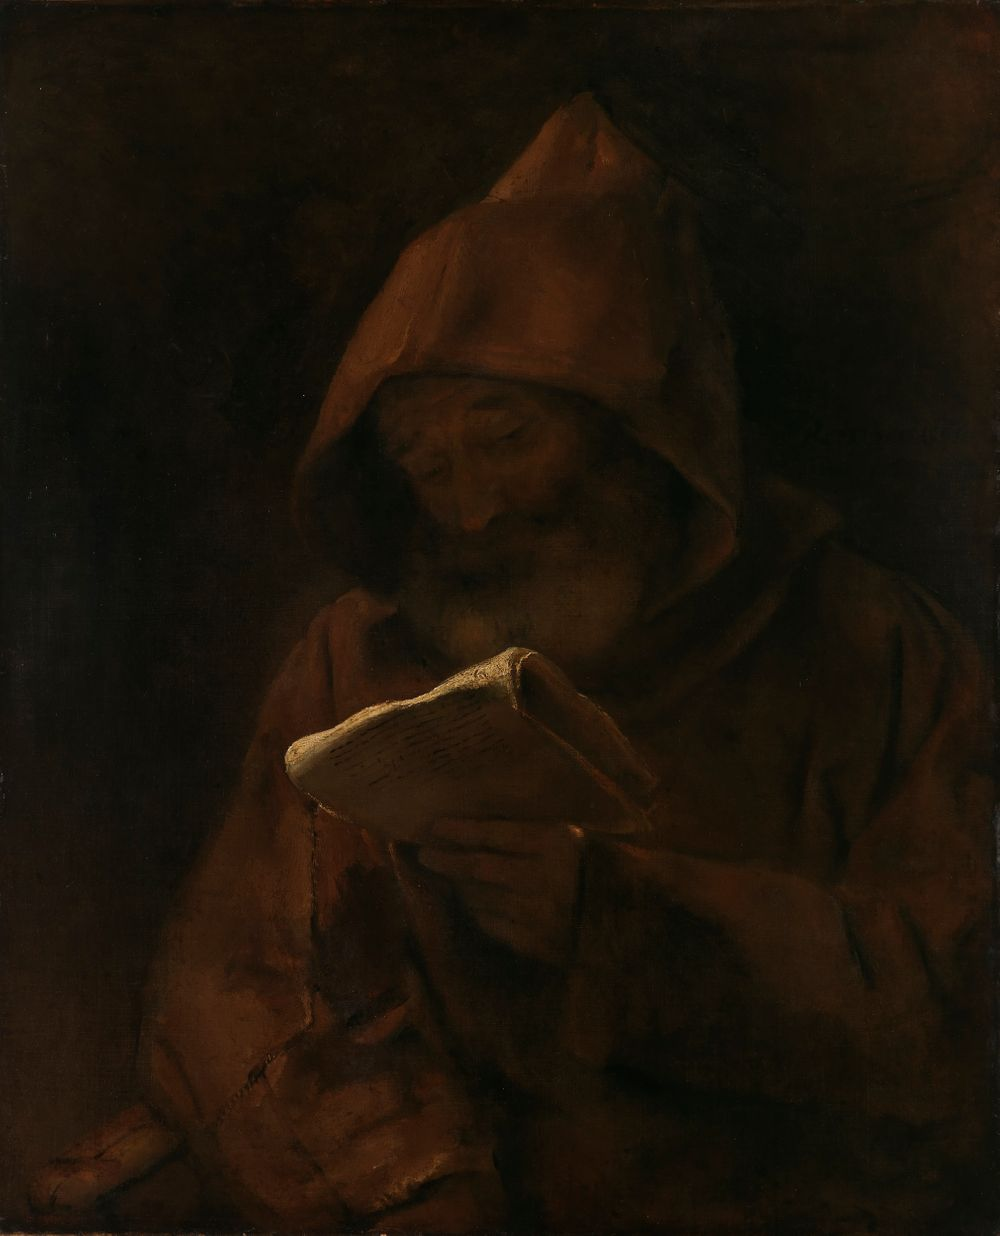 Lukeva munkki